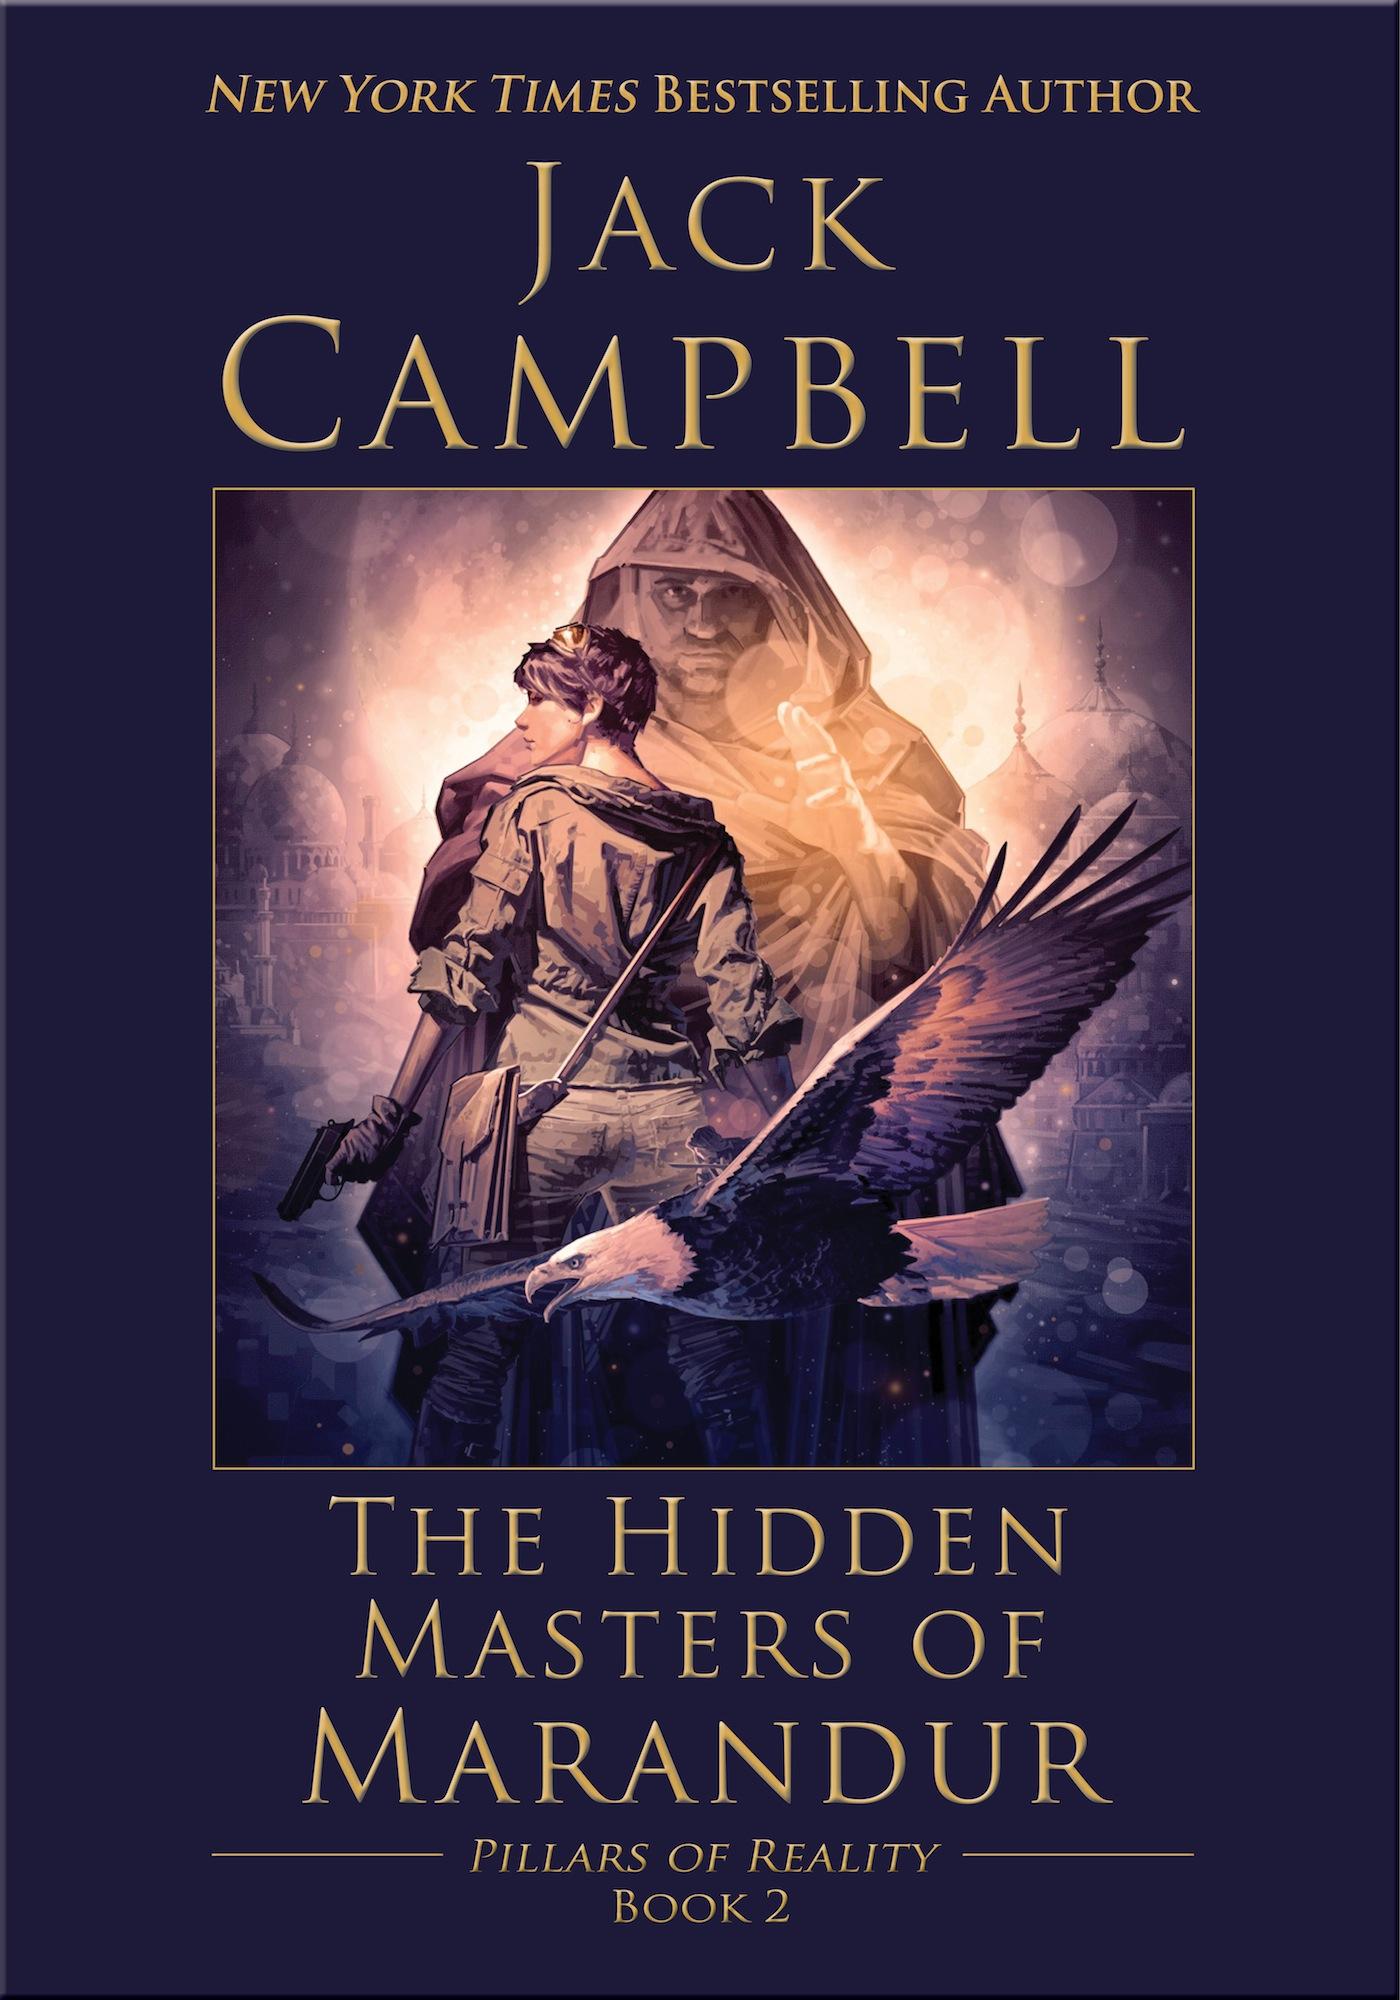 The Hidden Masters of Marandur by Jack Campbell